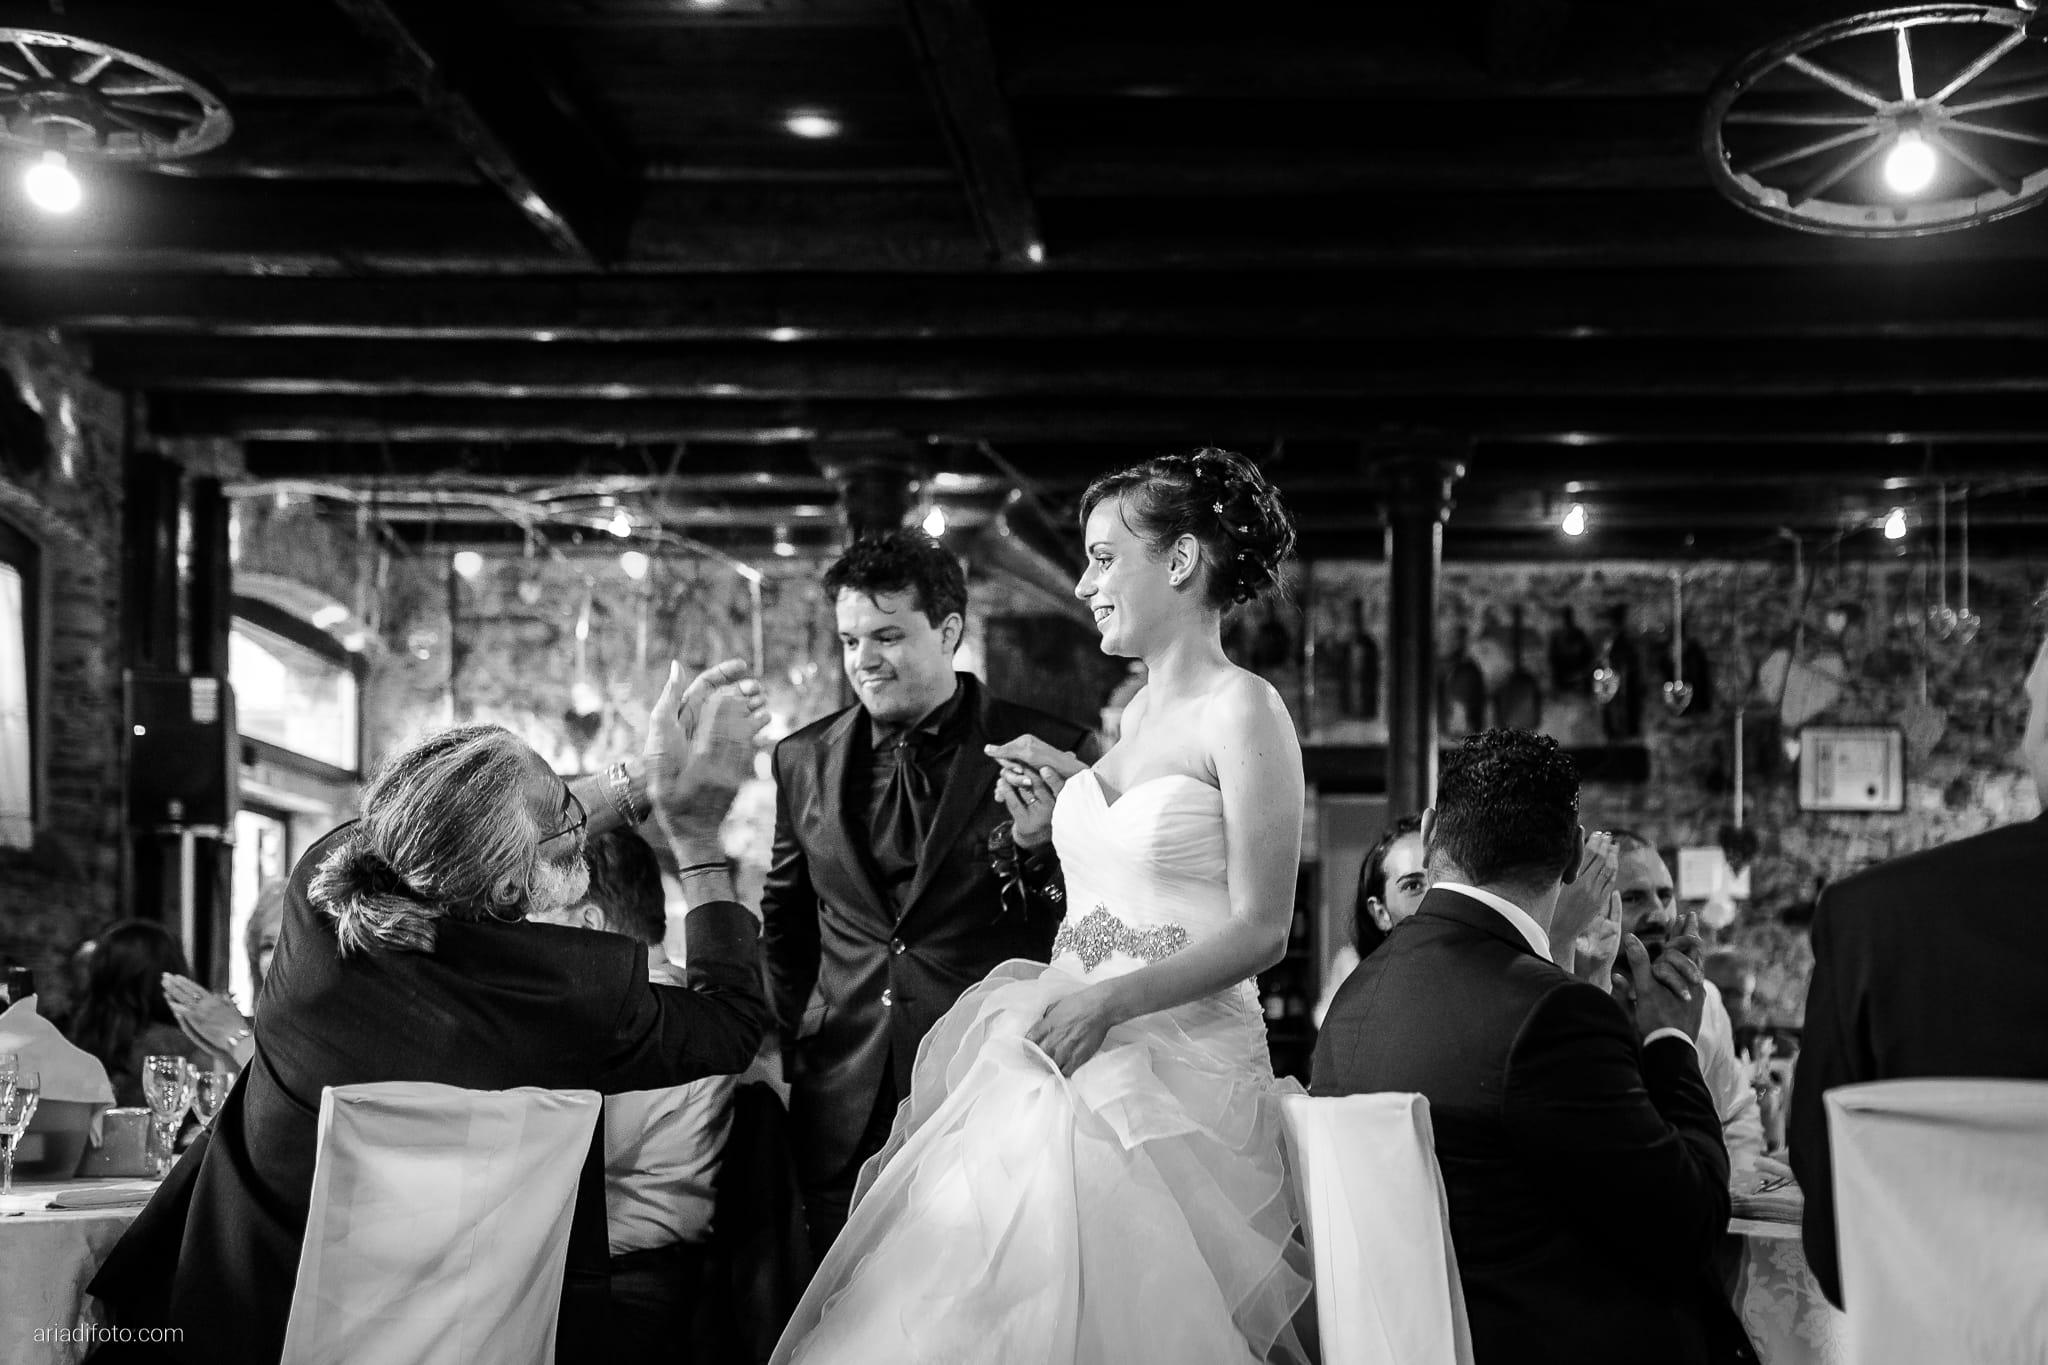 Sarah Matteo Matrimonio Moruzzo Agriturismo Il Vagabondo Buttrio Udine ricevimento ingresso sposi